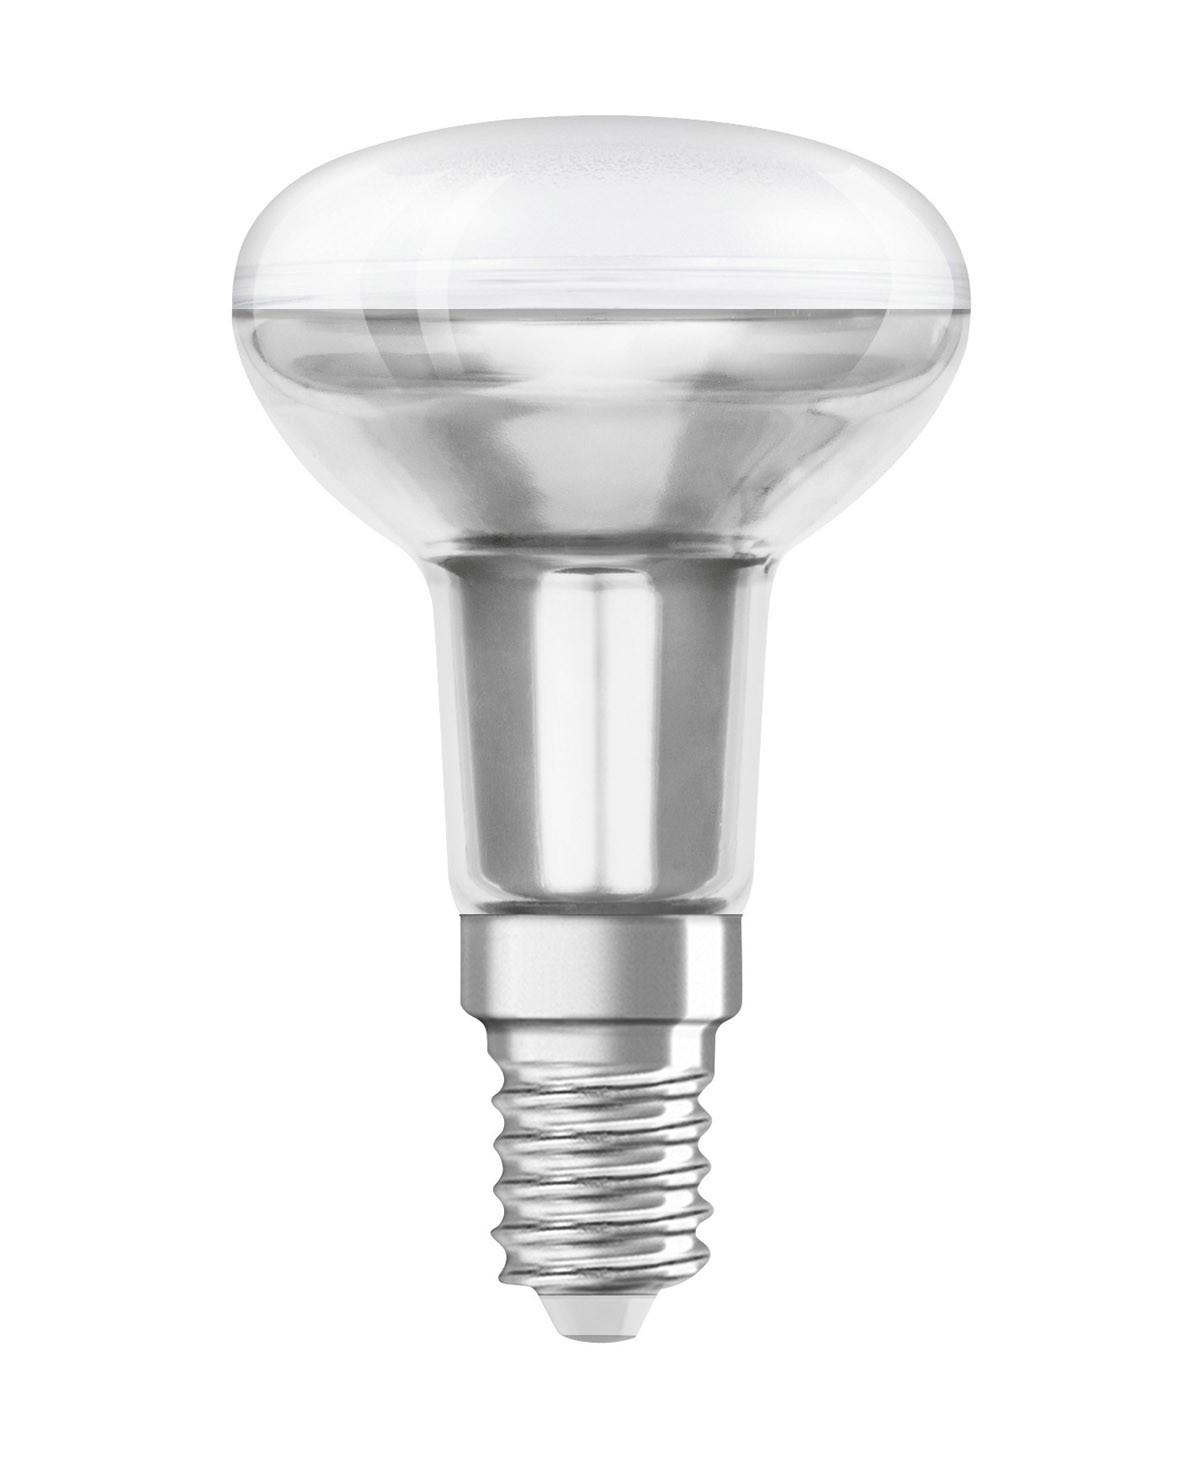 Led Lampen E14  LED Leuchtmittel mit E14 Sockel